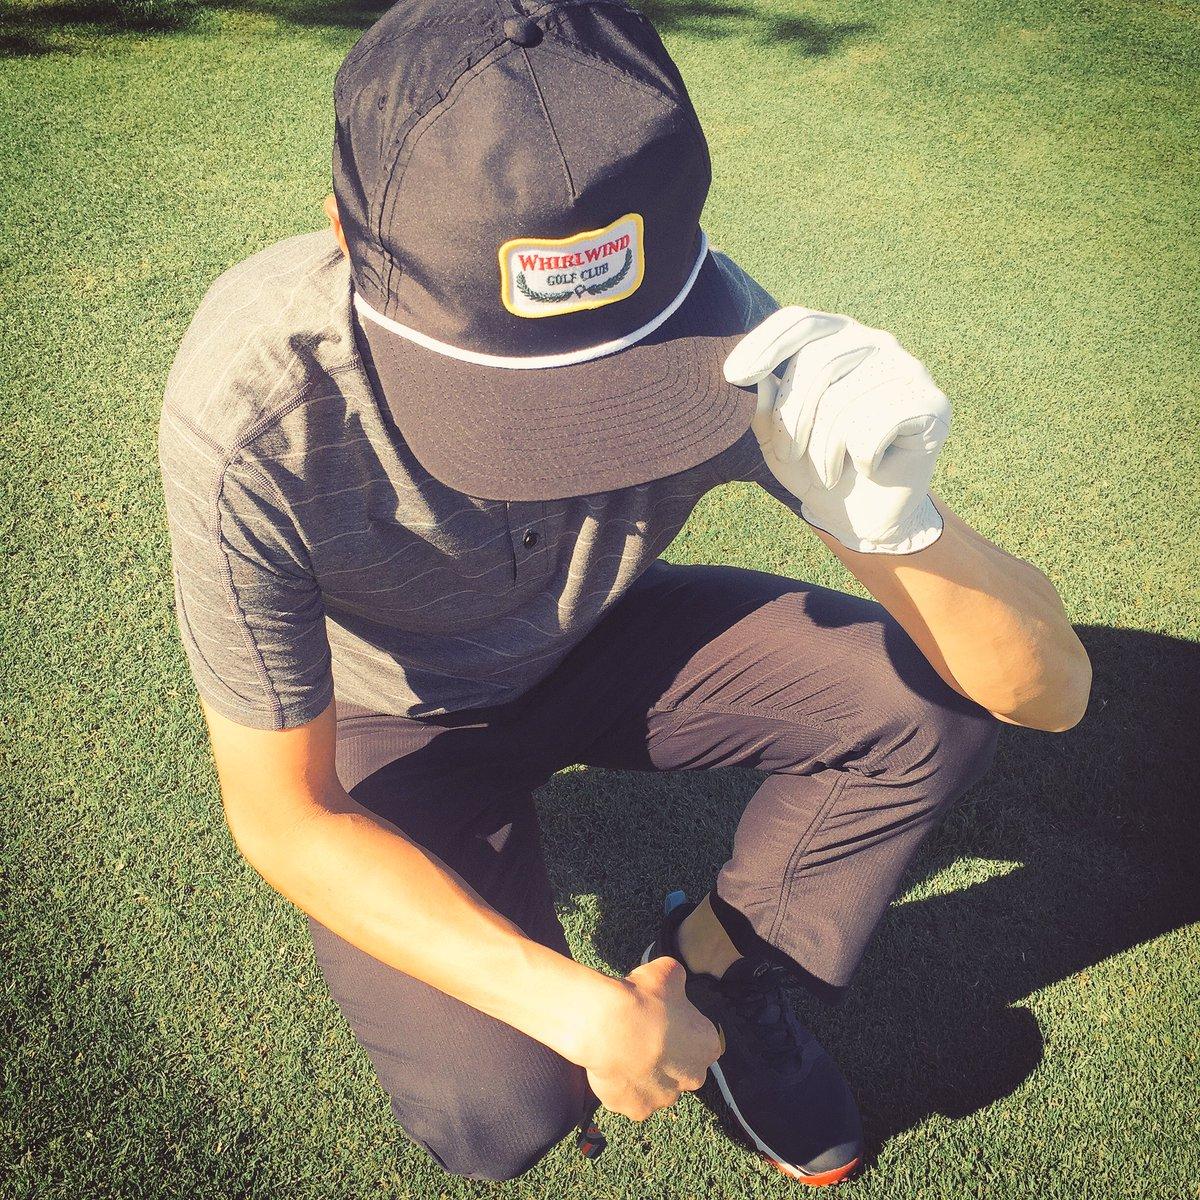 Whirlwind Golf on Twitter